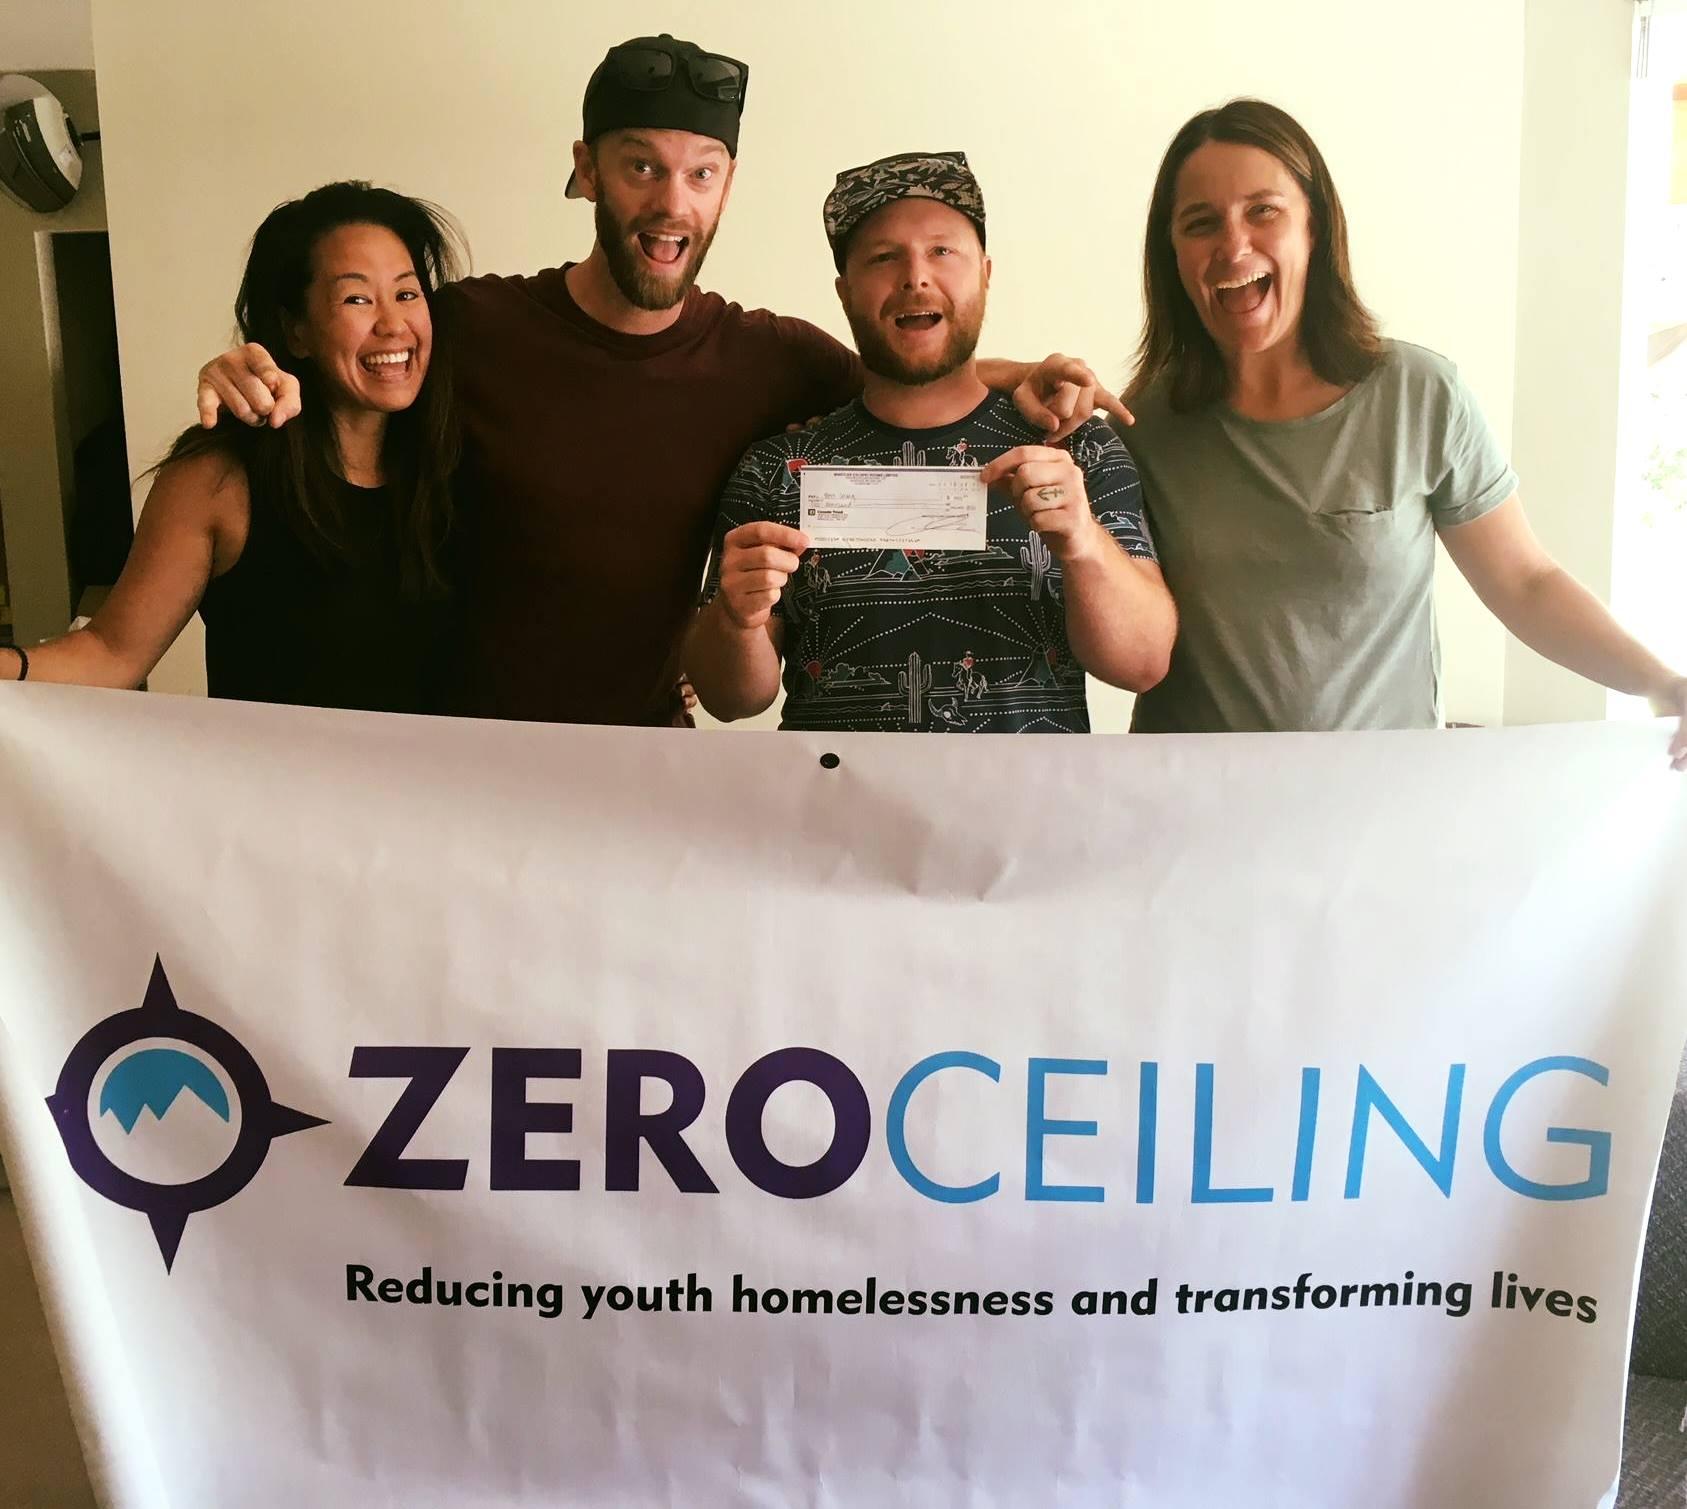 Zero Ceiling Society of Canada